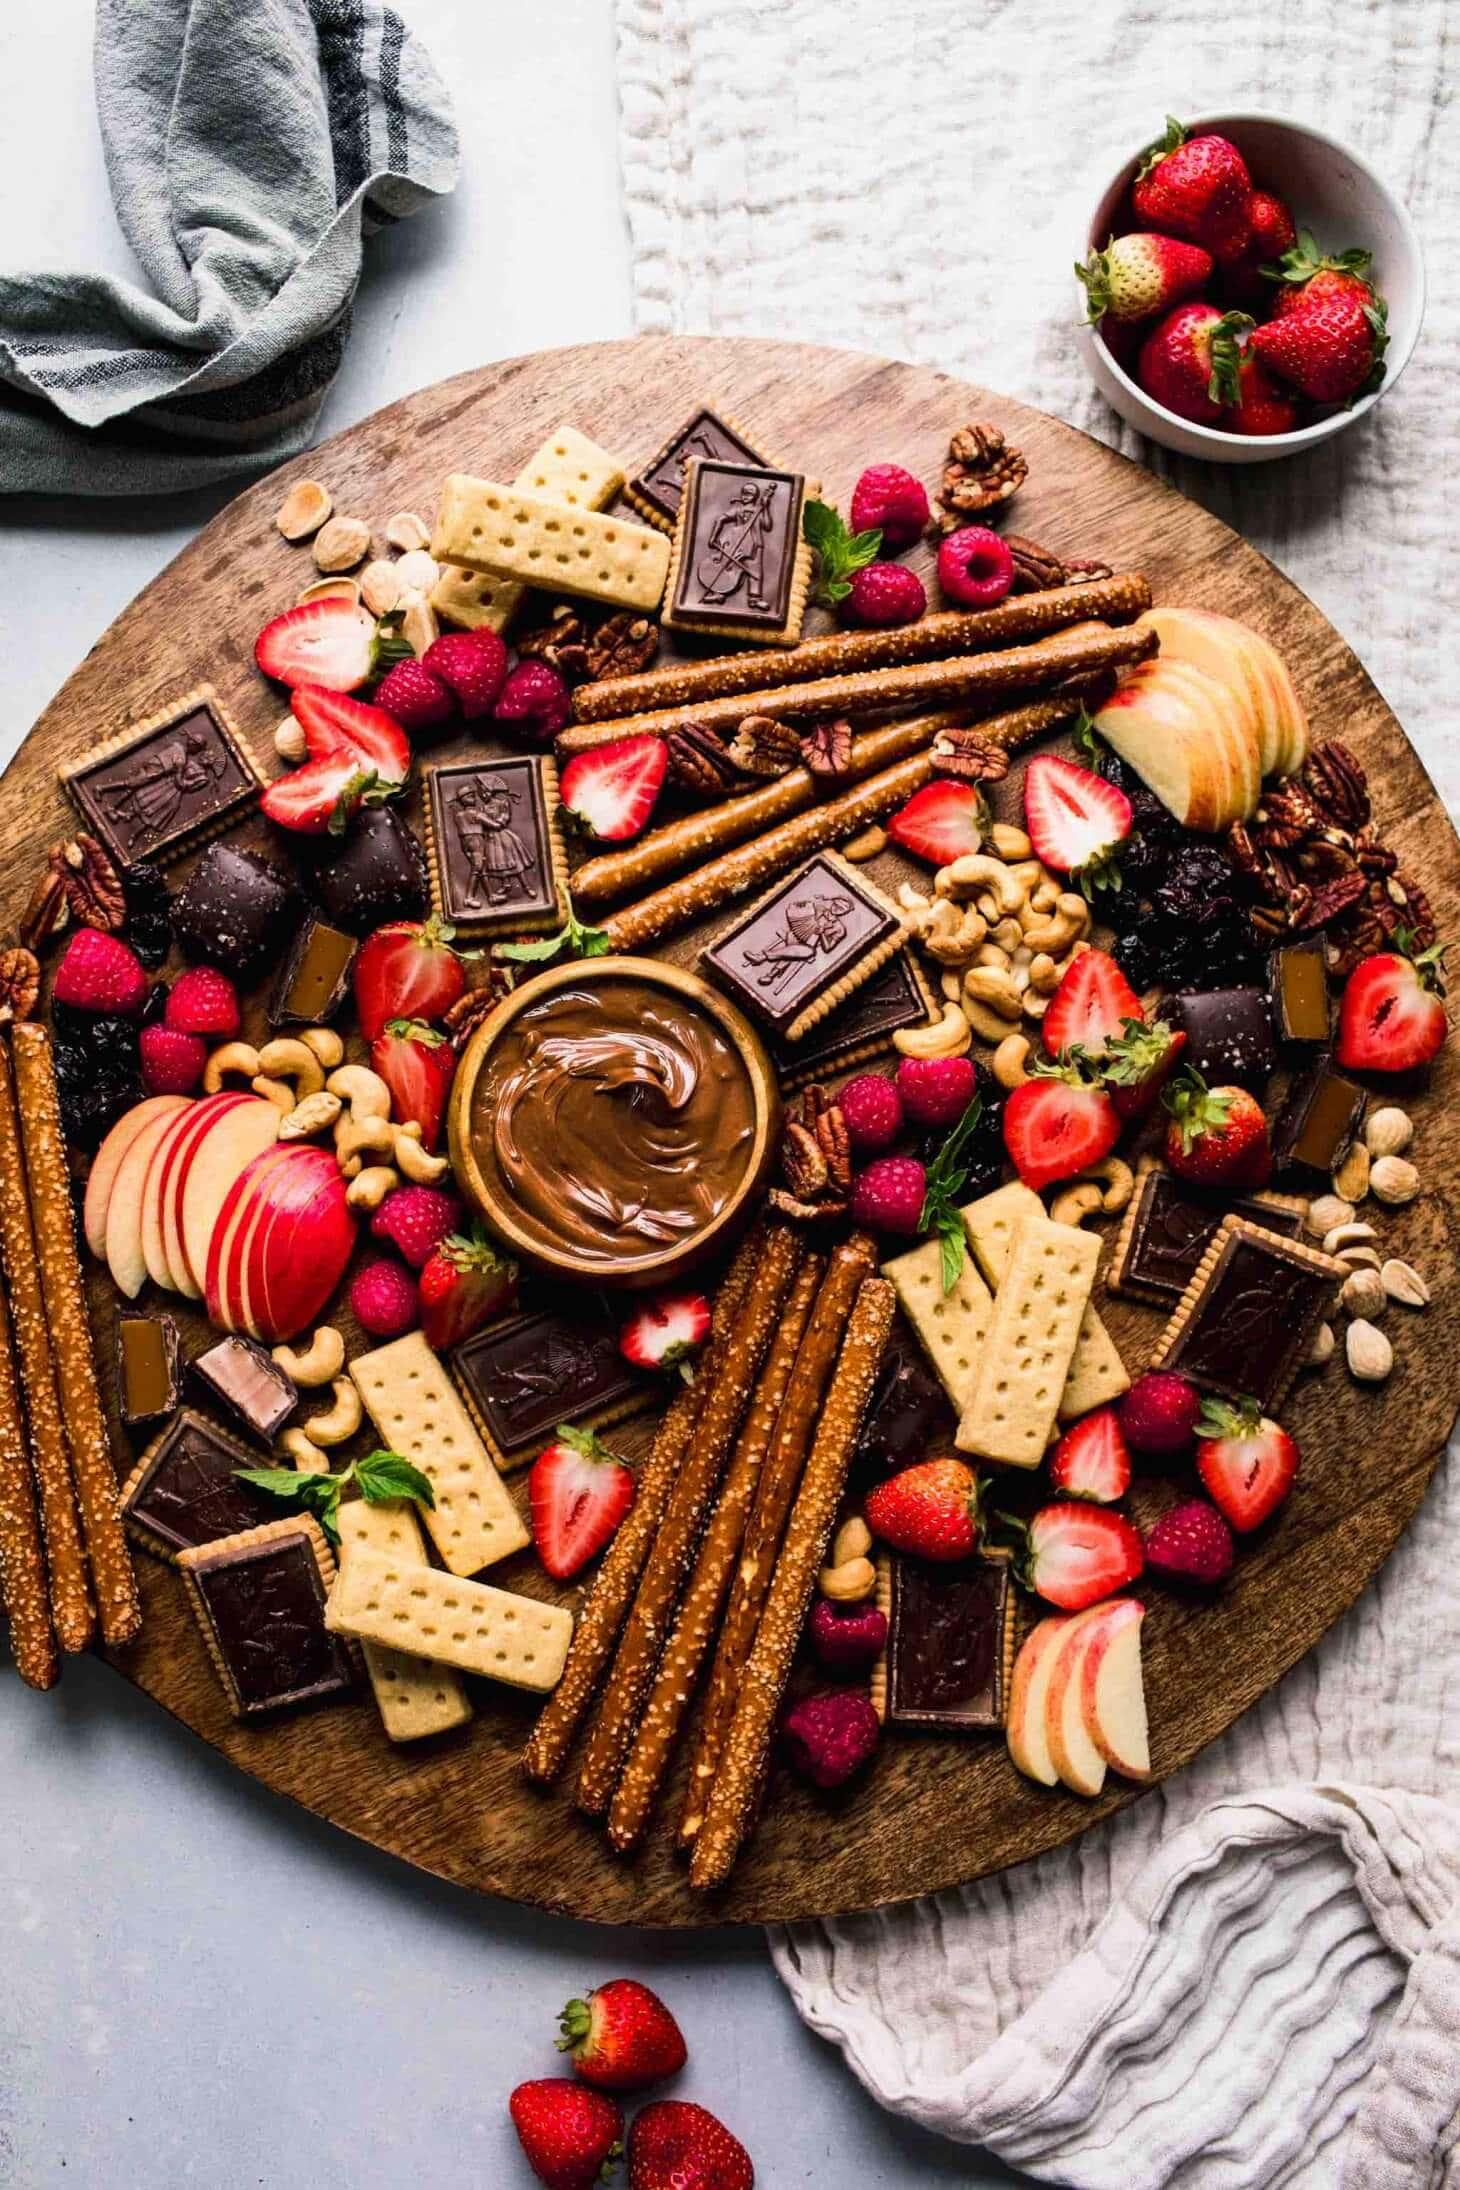 Dessert board arranged on wood round serving tray.